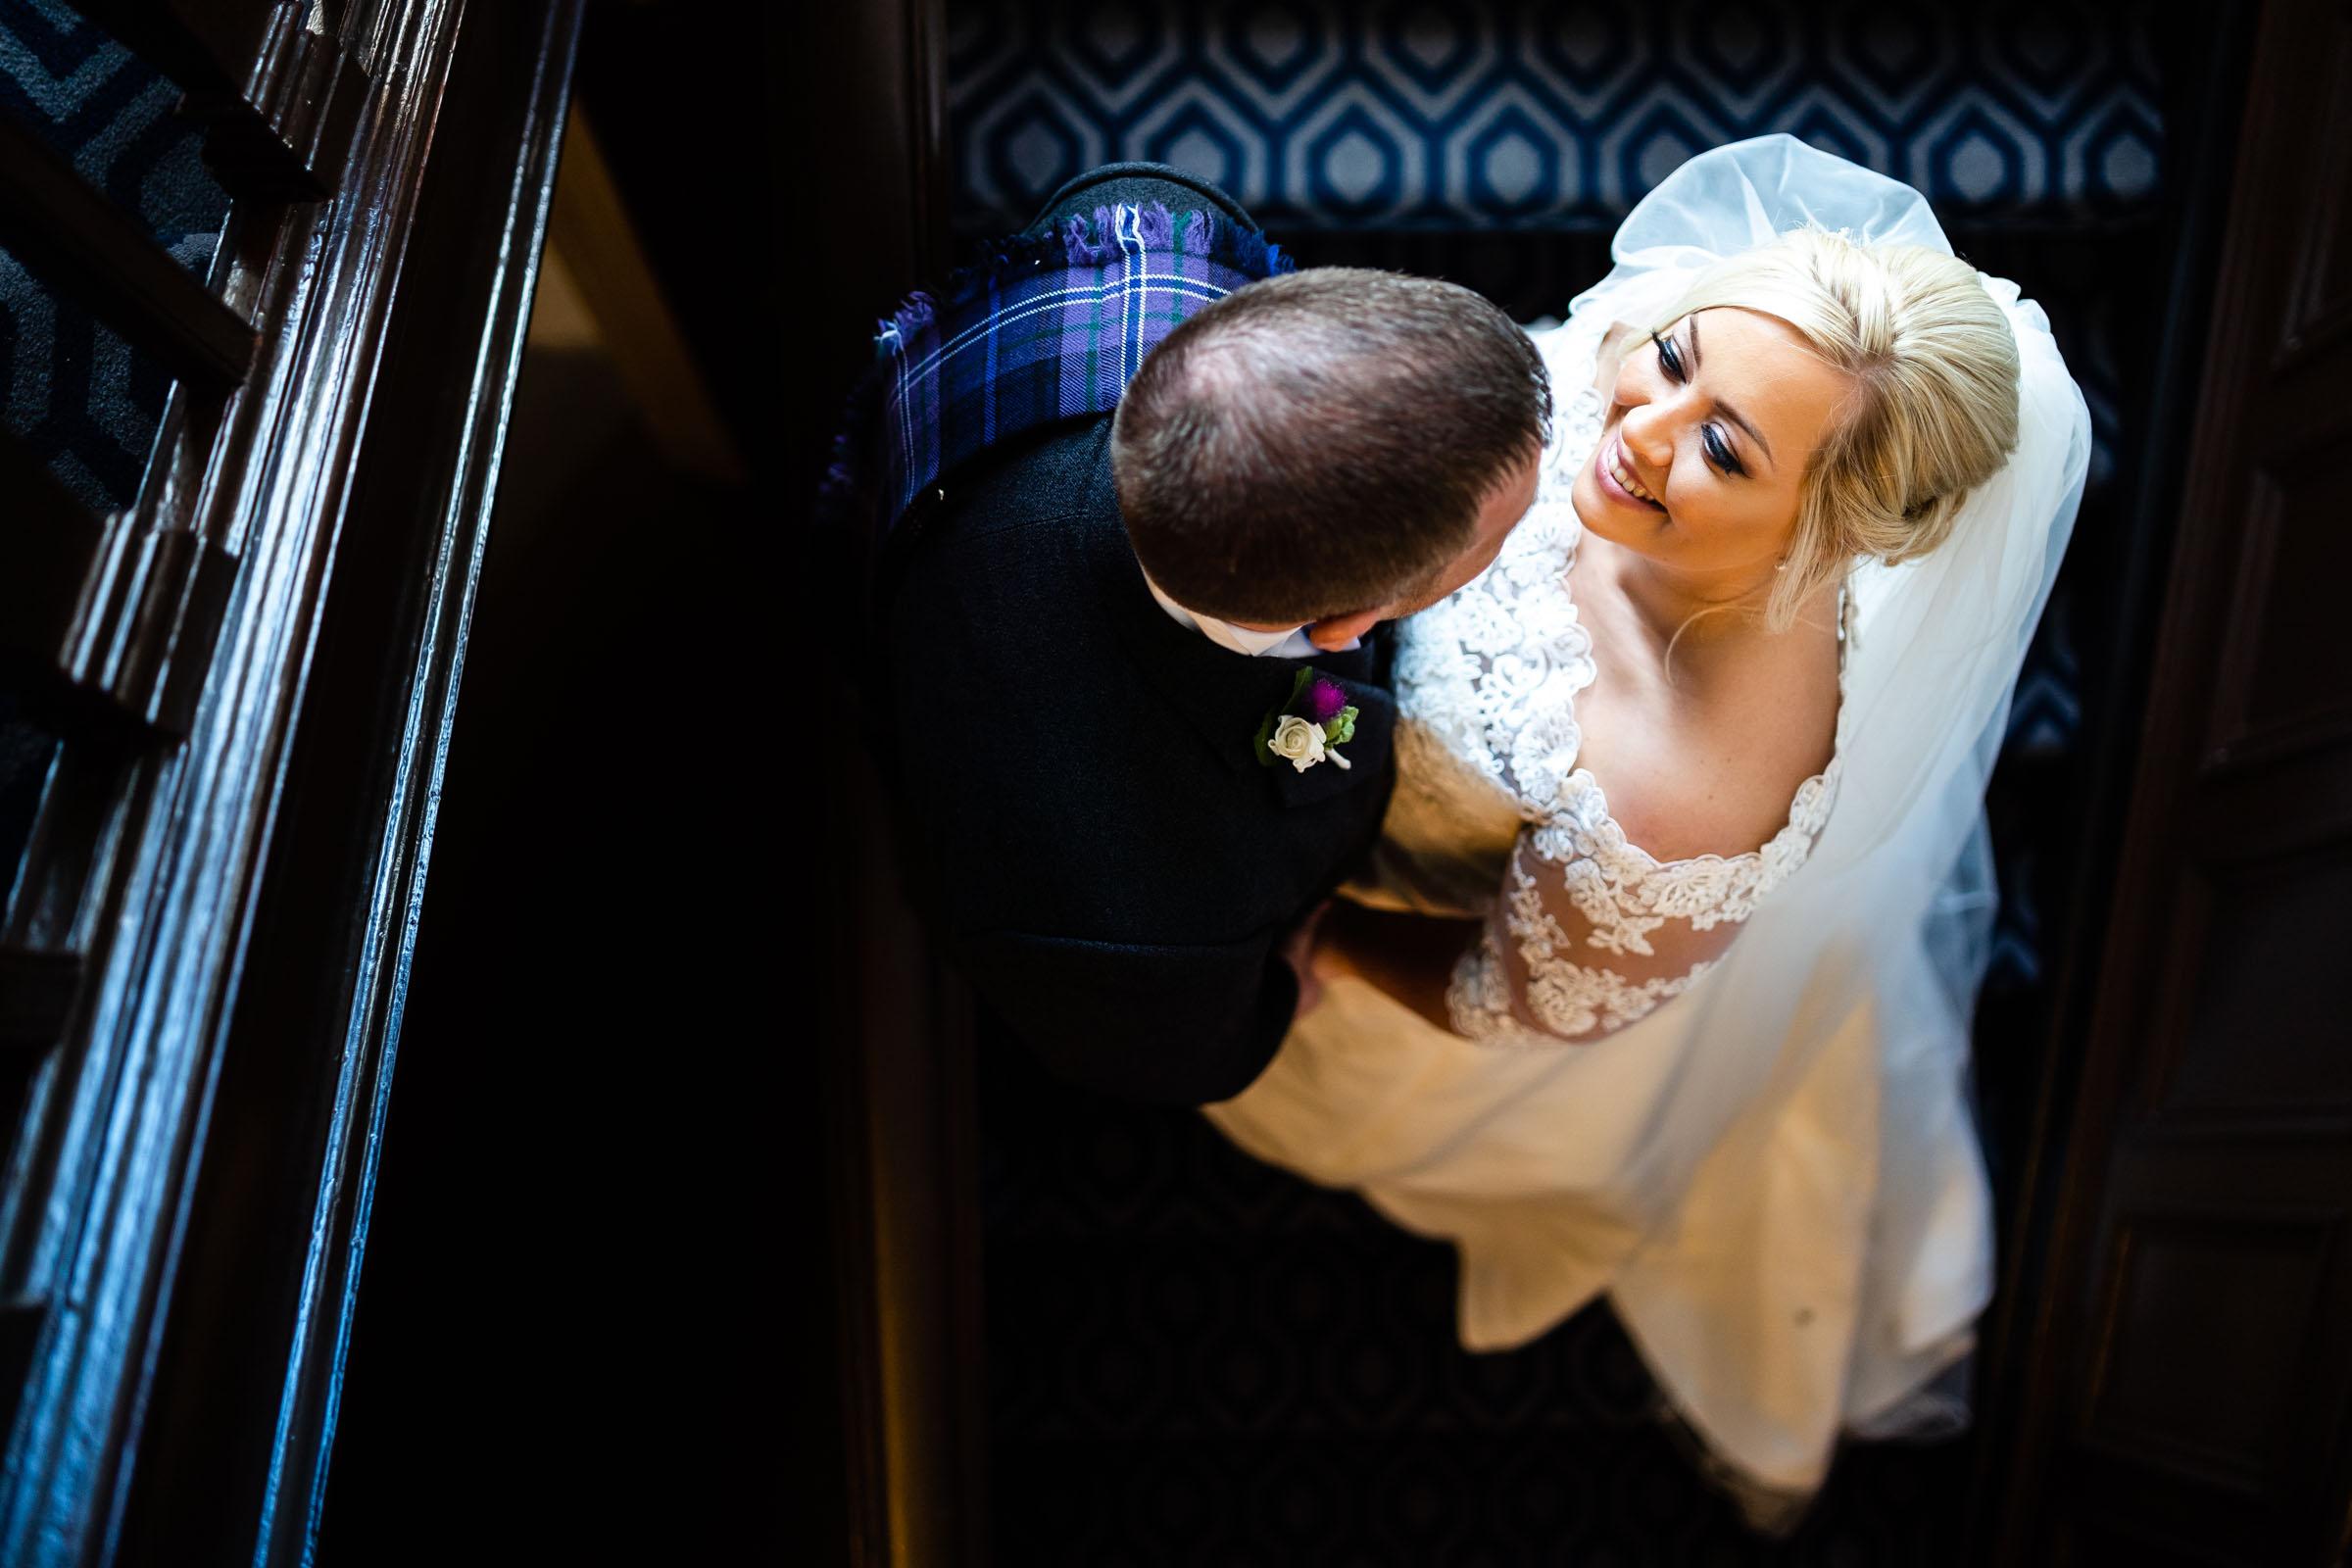 motherwell-moorings-wedding-photographer-dearlyphotography (60 of 77).jpg